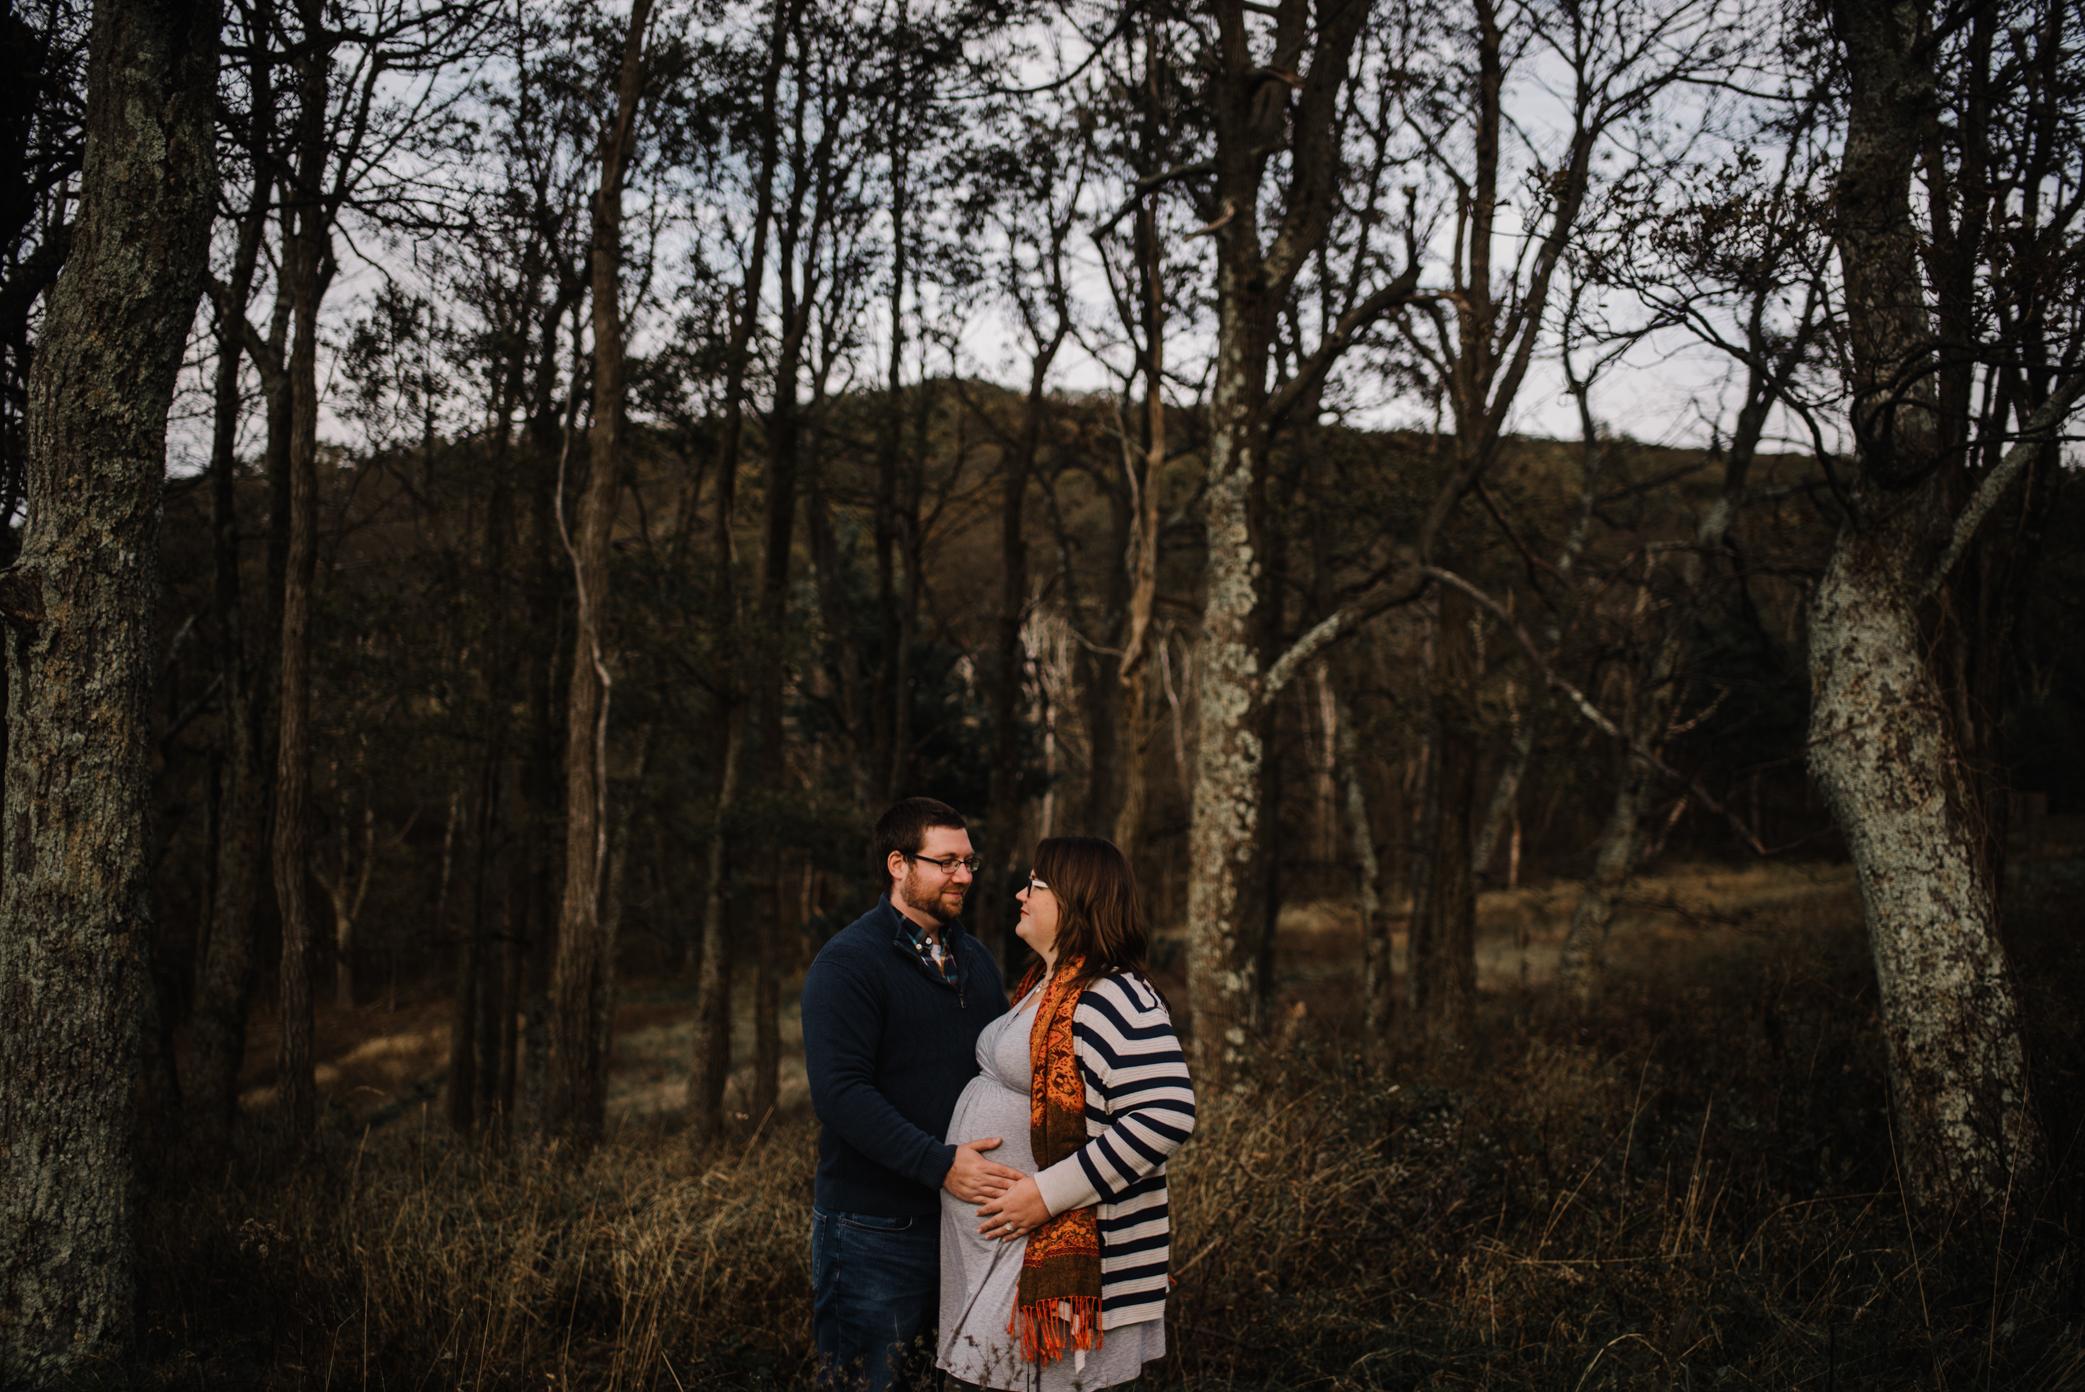 Sarah and Evan Maternity Session Shenandoah National Park Blue Ridge Mountains Skyline Drive Adventure Photographer White Sails Creative_7.JPG